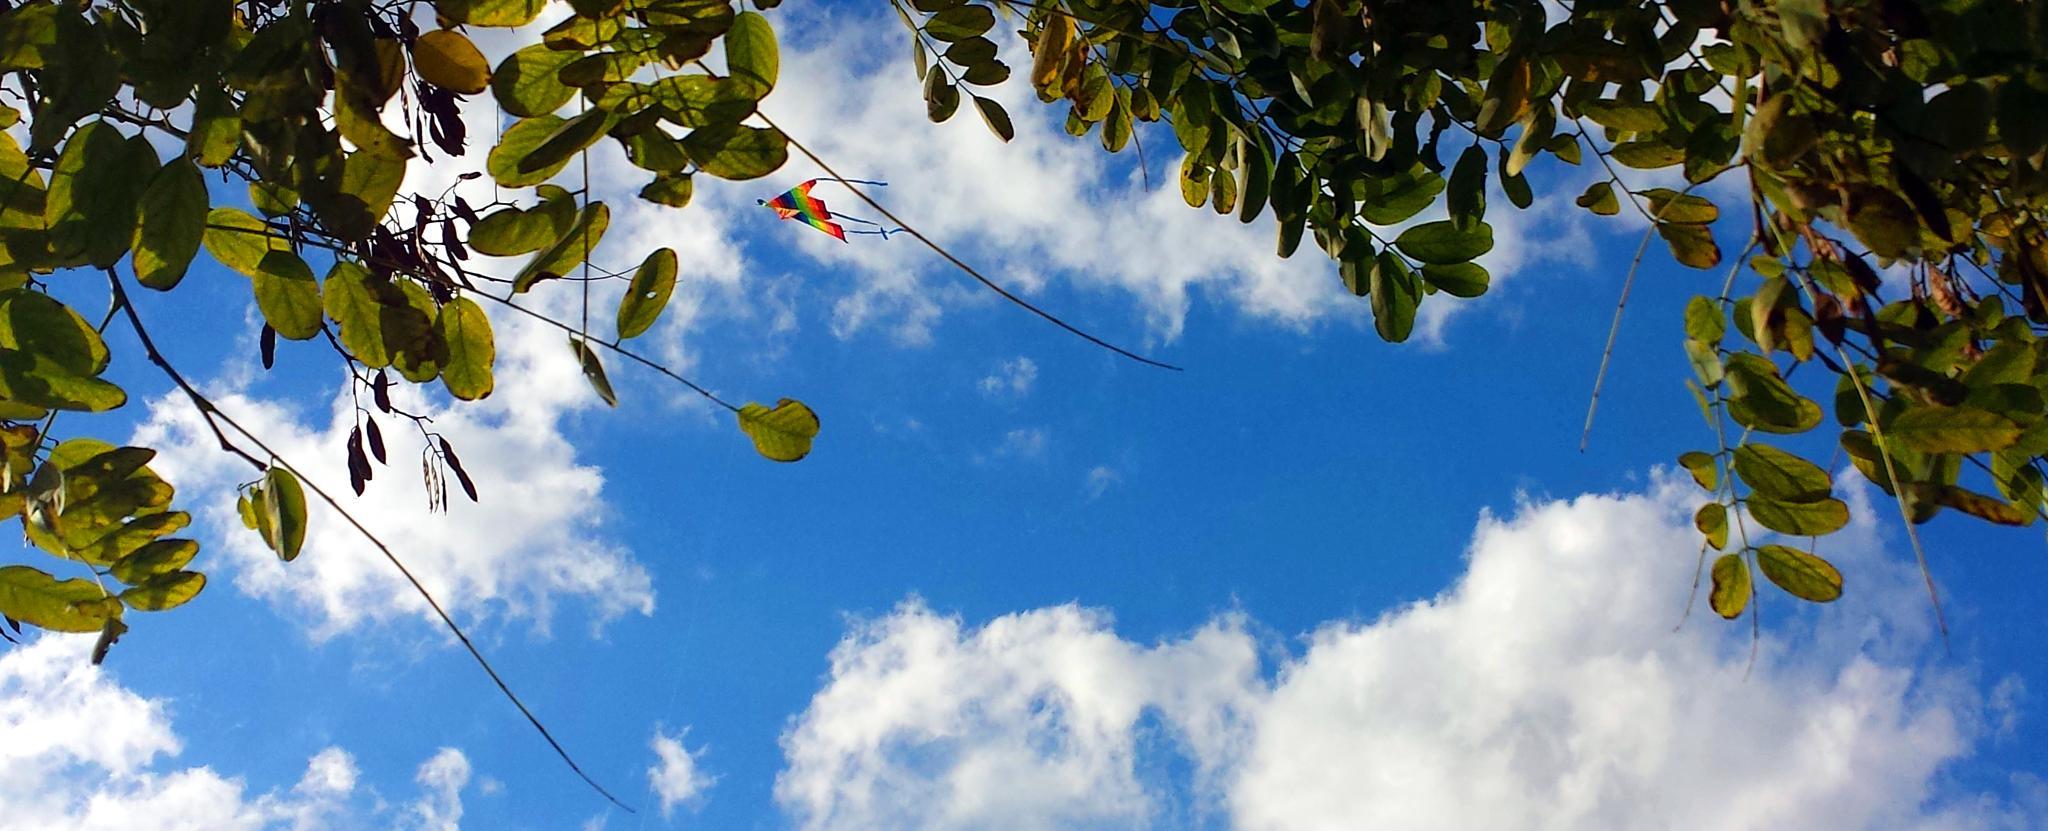 Little butterfly in the sky by Blueanna